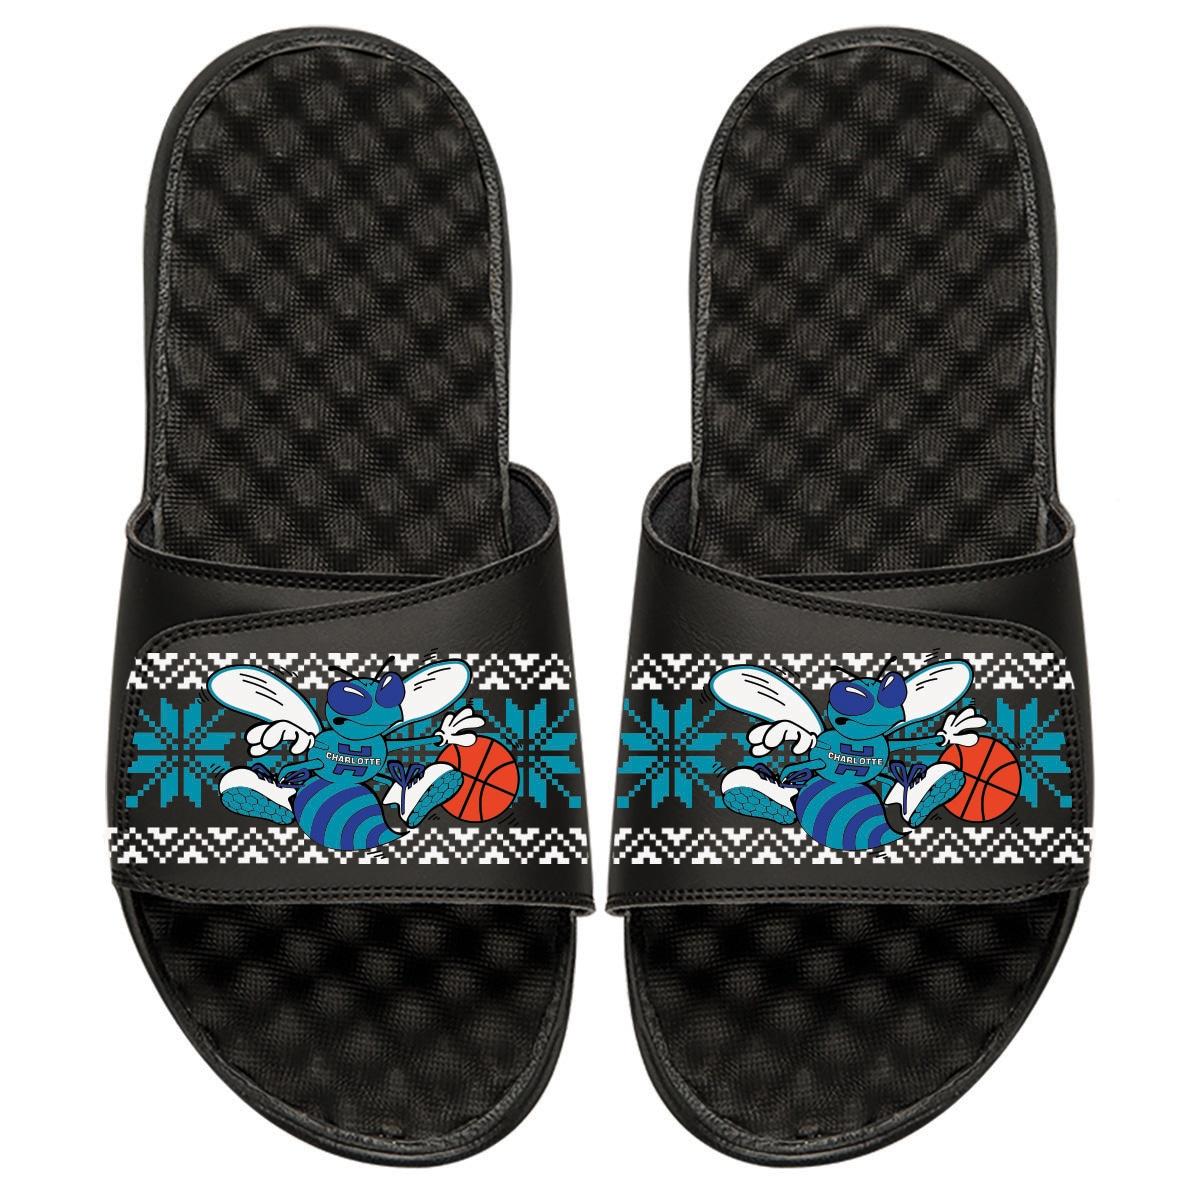 Charlotte Hornets ISlide Ugly Sweater Slide Sandals - Black